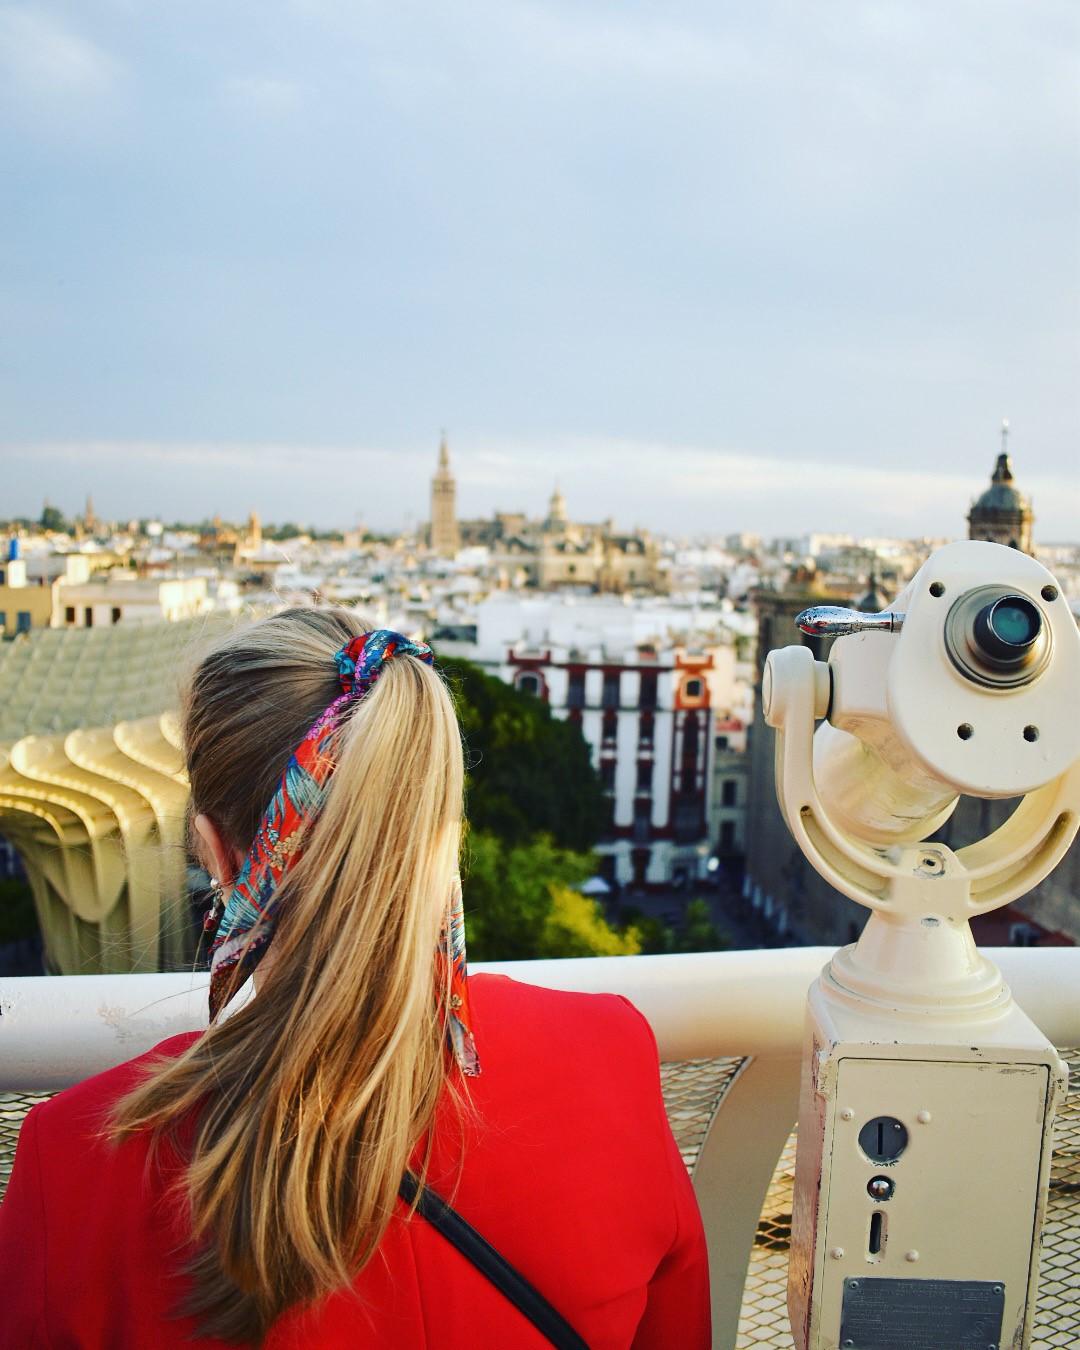 Gastblogger Valerie in haar geliefd Spanje (Setas de Sevilla)